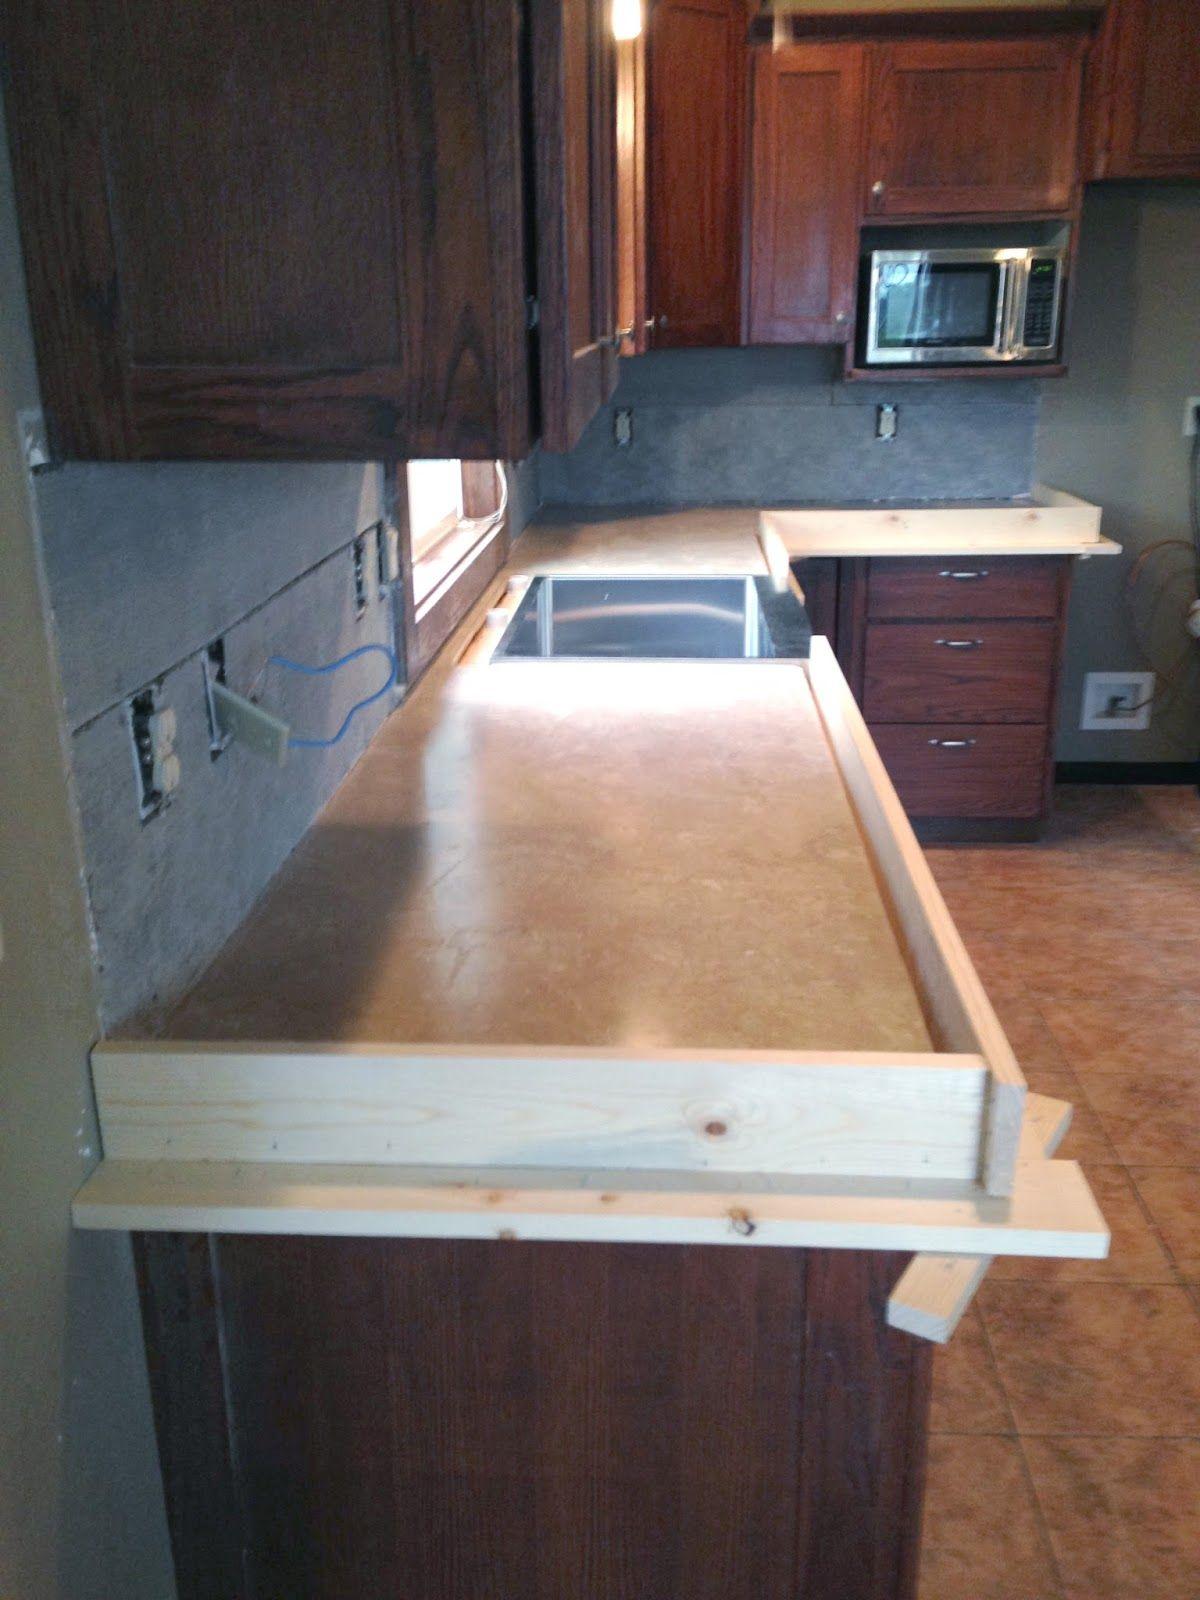 Diy Concrete Counters Poured Over Laminate Diy Kitchen Countertops Diy Concrete Countertops Diy Countertops